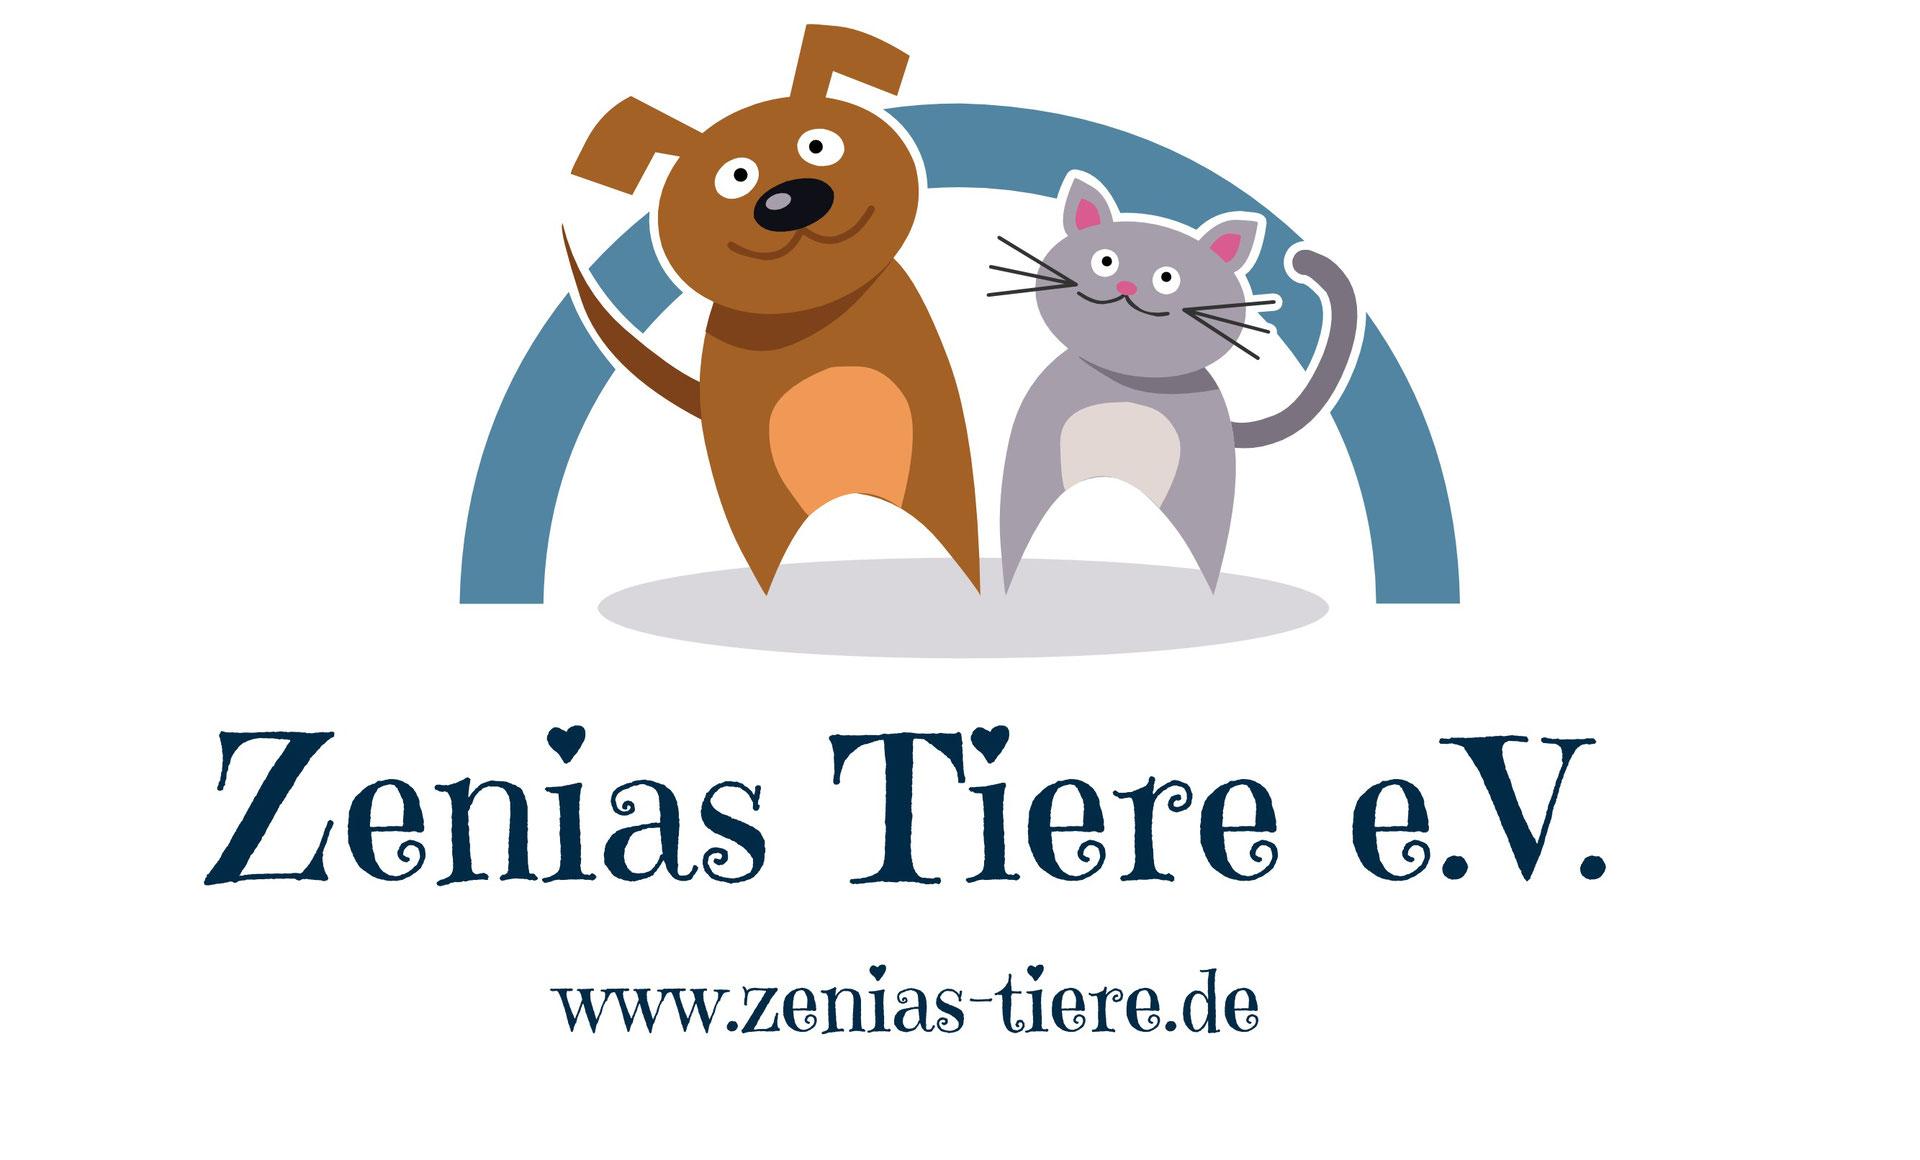 Zenias Tiere